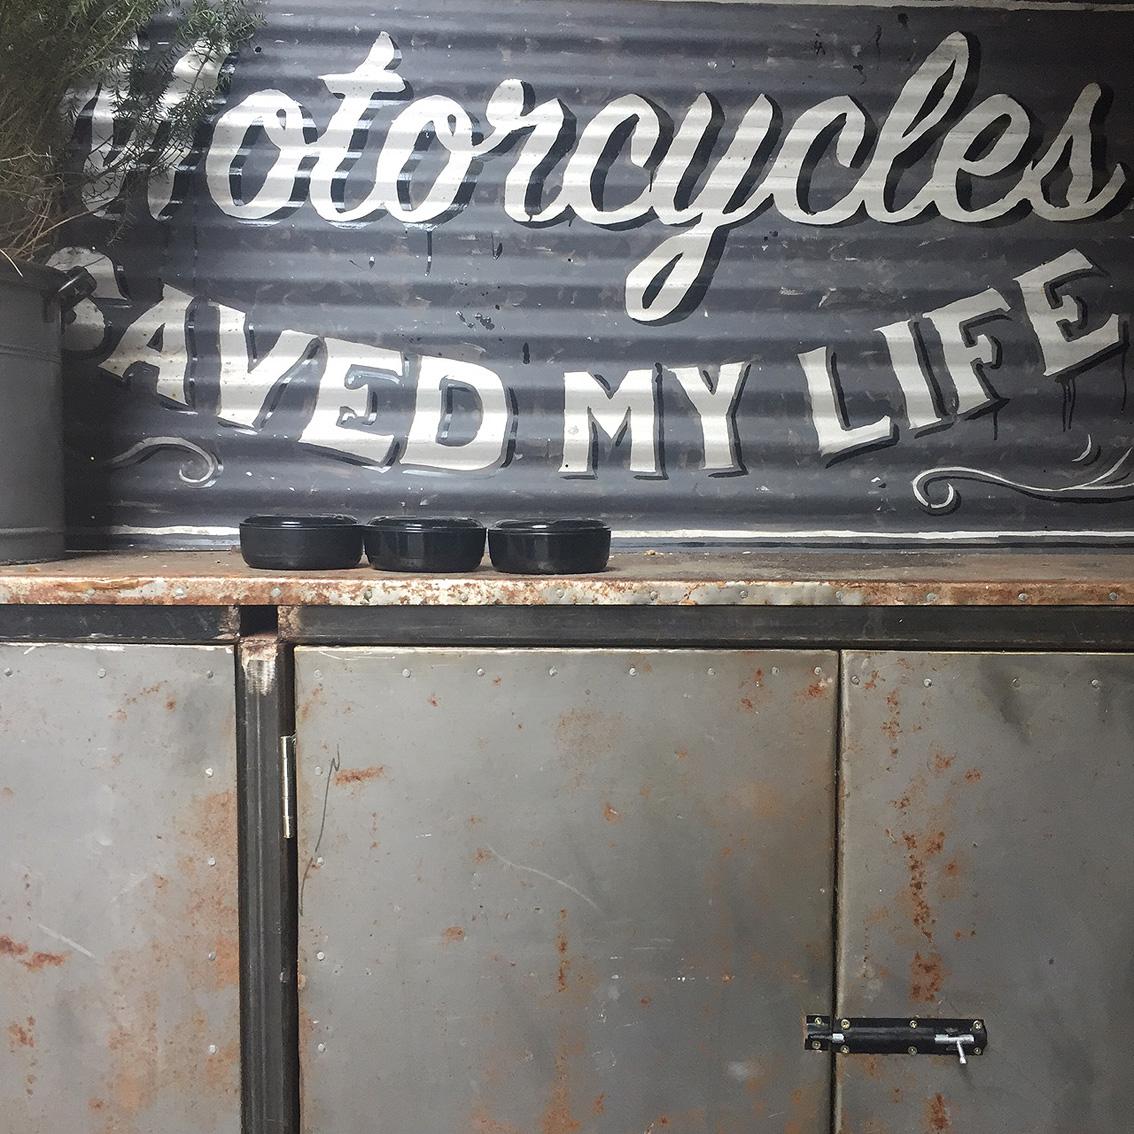 MotorCyclesSavedMyLife